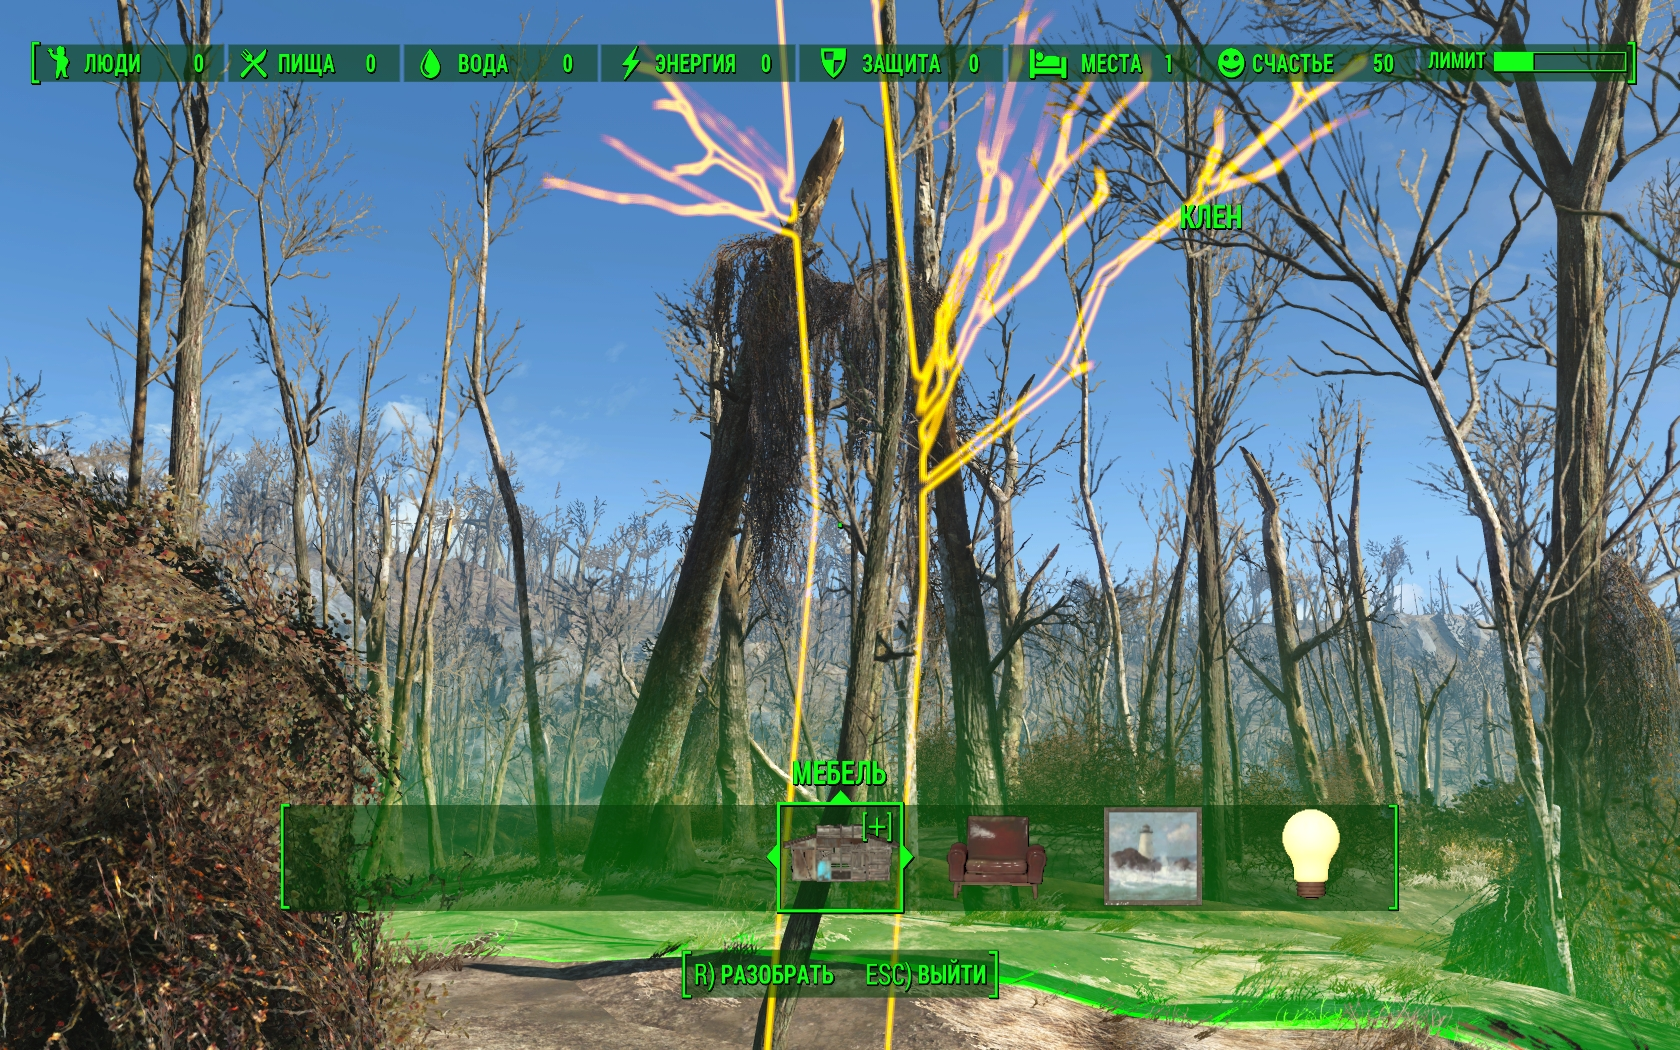 Невидимое дерево (Сэнкчуари) - Fallout 4 Баг